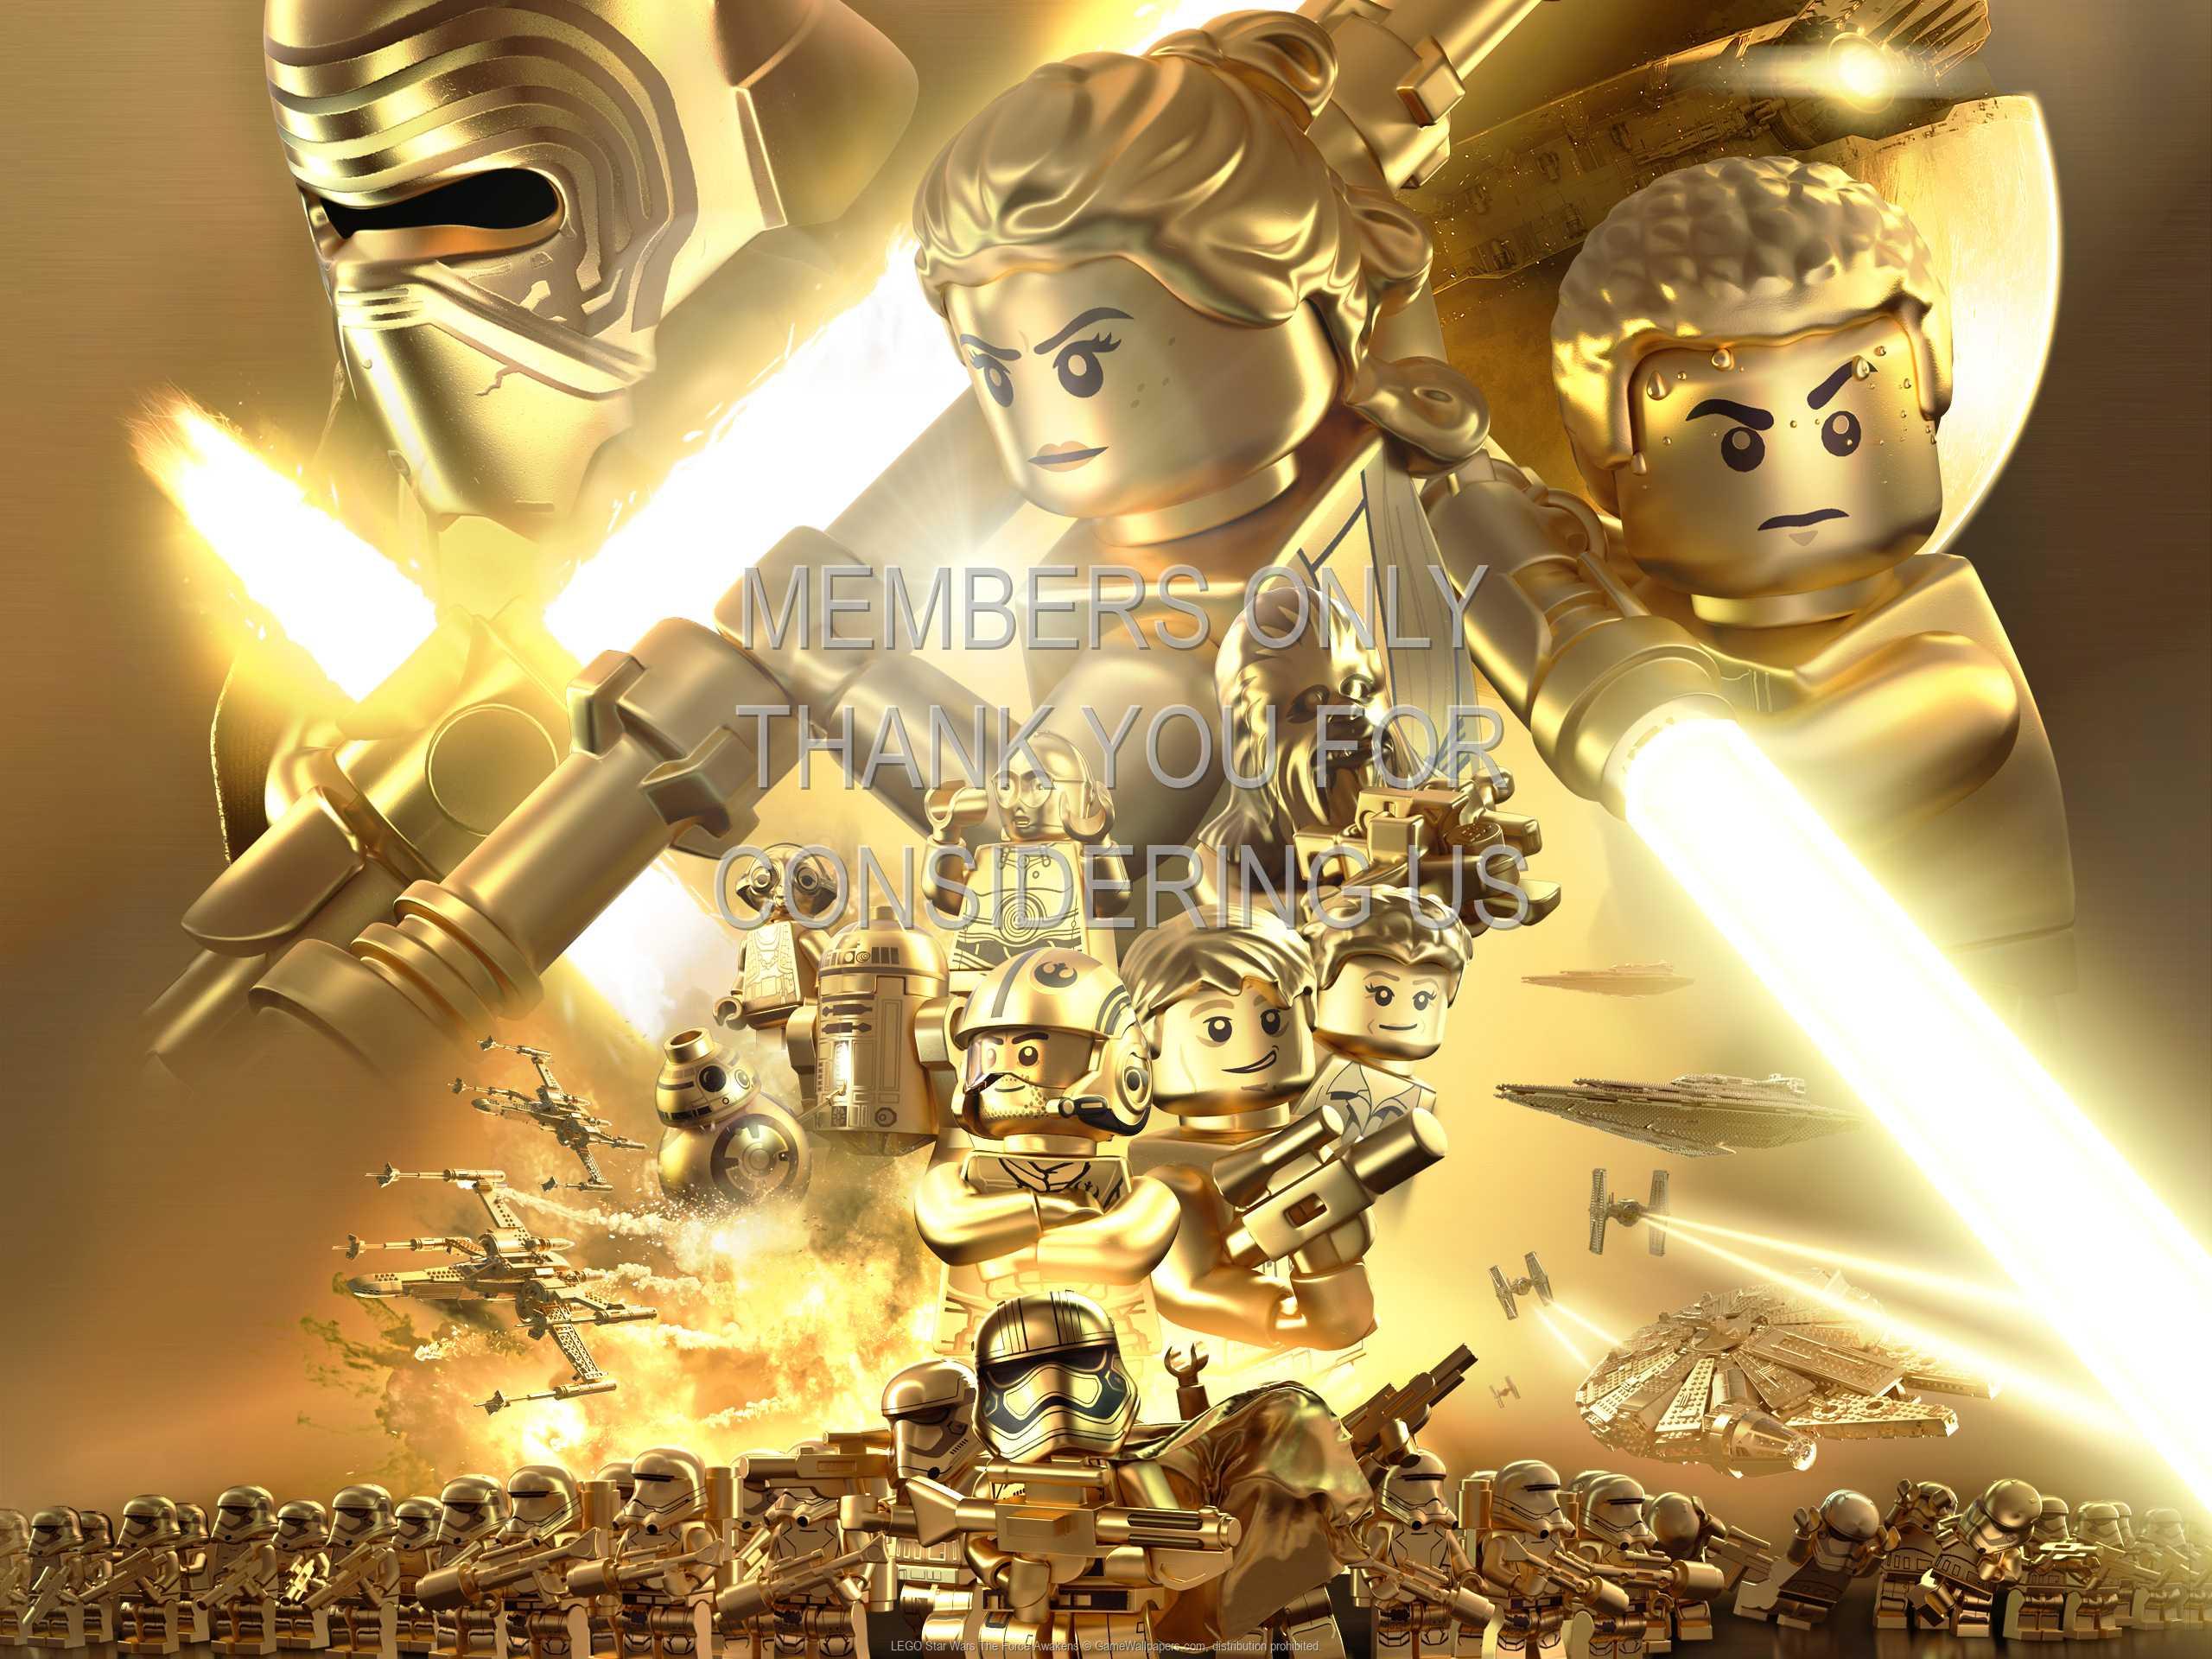 Lego Star Wars The Force Awakens Wallpaper 02 1080p Horizontal